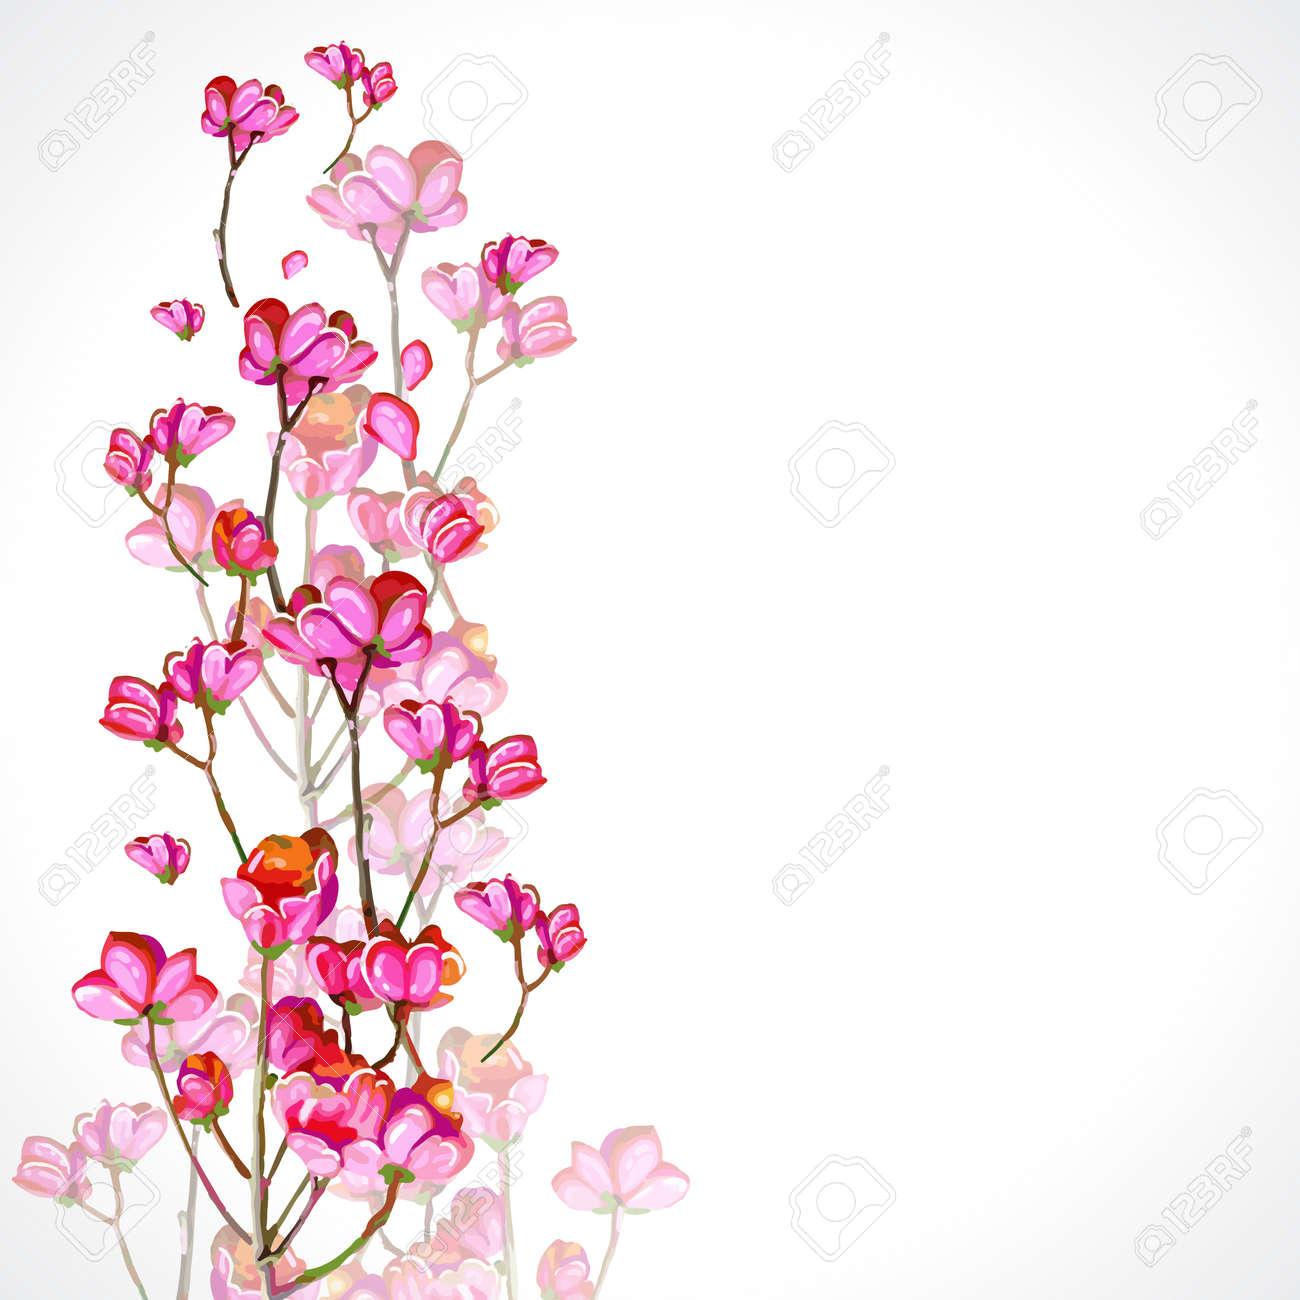 Magnificent Creative Flowers White Plains Vignette Images For